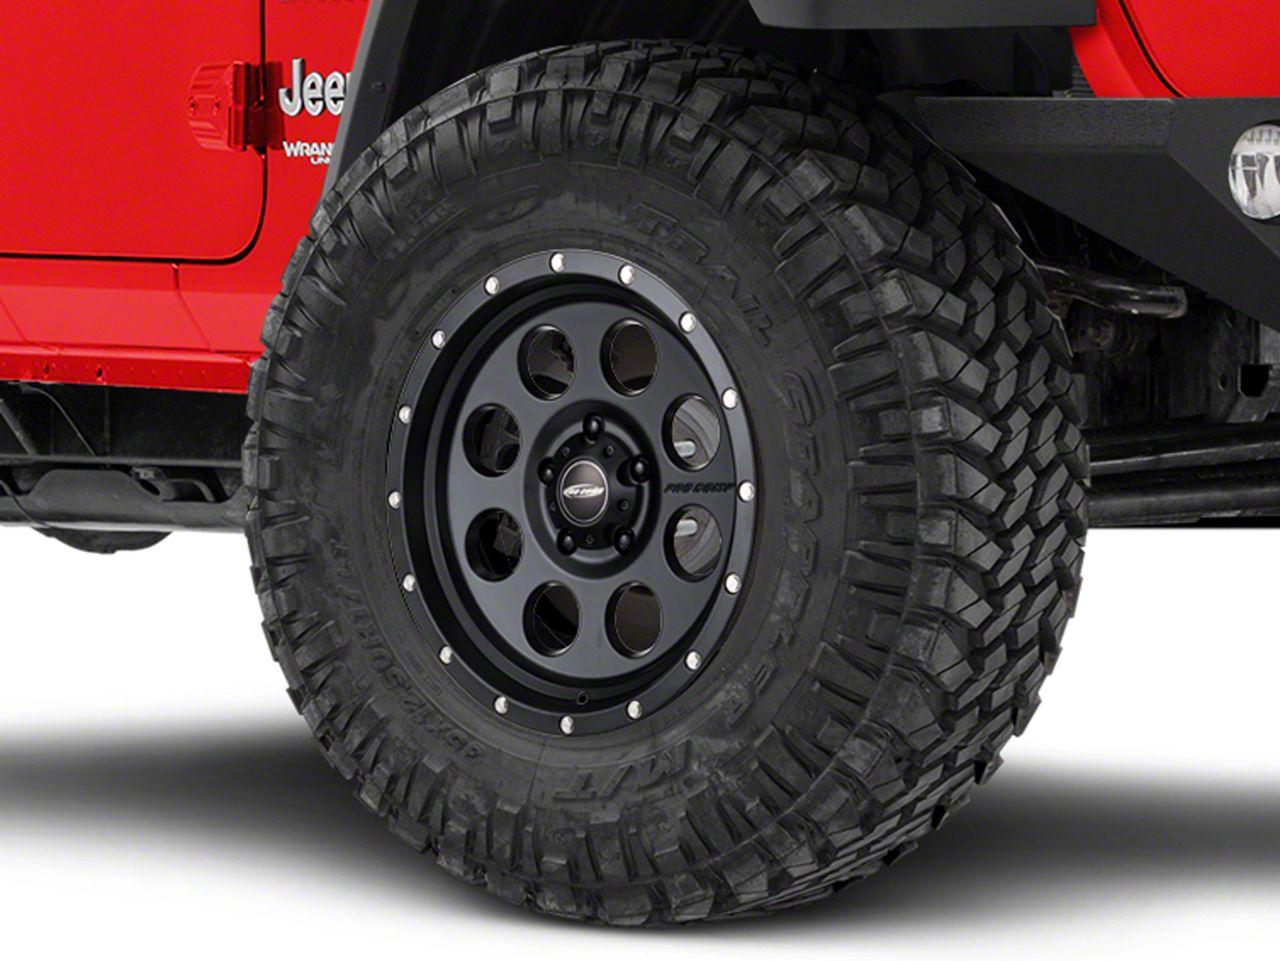 Pro Comp Wheels Alloy Series 45 Proxy Satin Black Wheel - 17x9 (18-19 Jeep Wrangler JL)